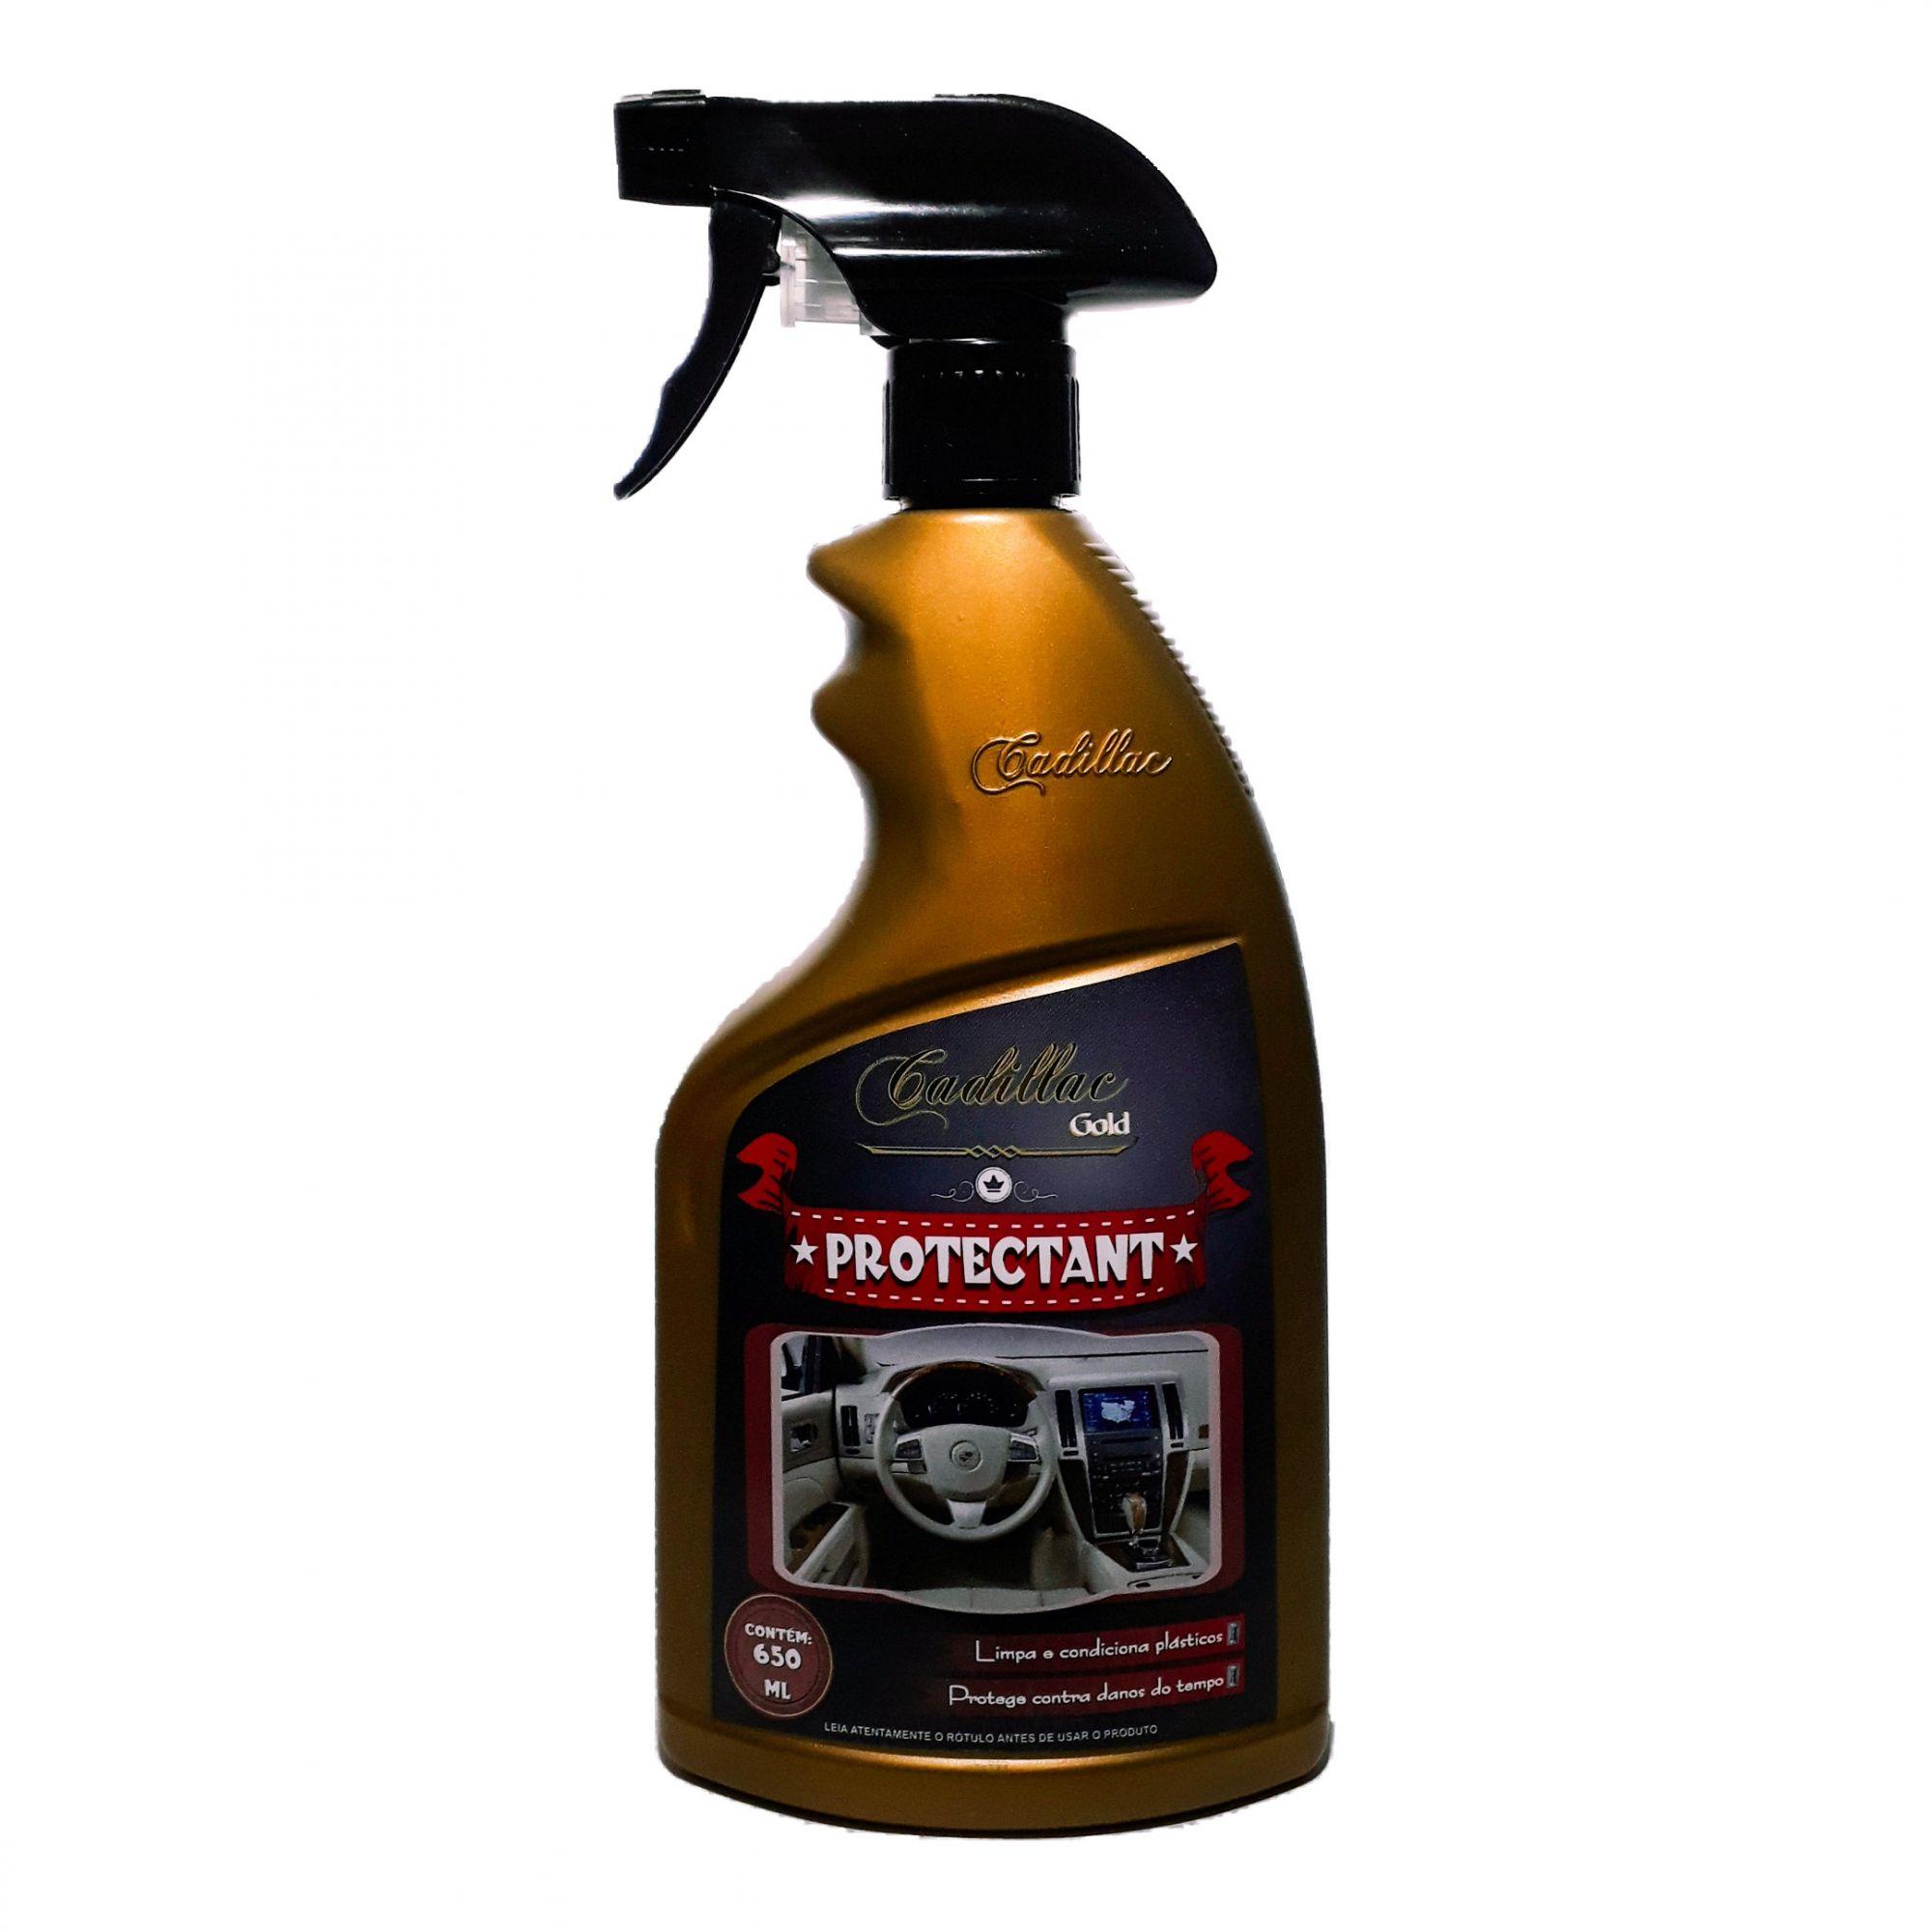 Limpa condiciona protege plastico Protectant Cadillac 650ml